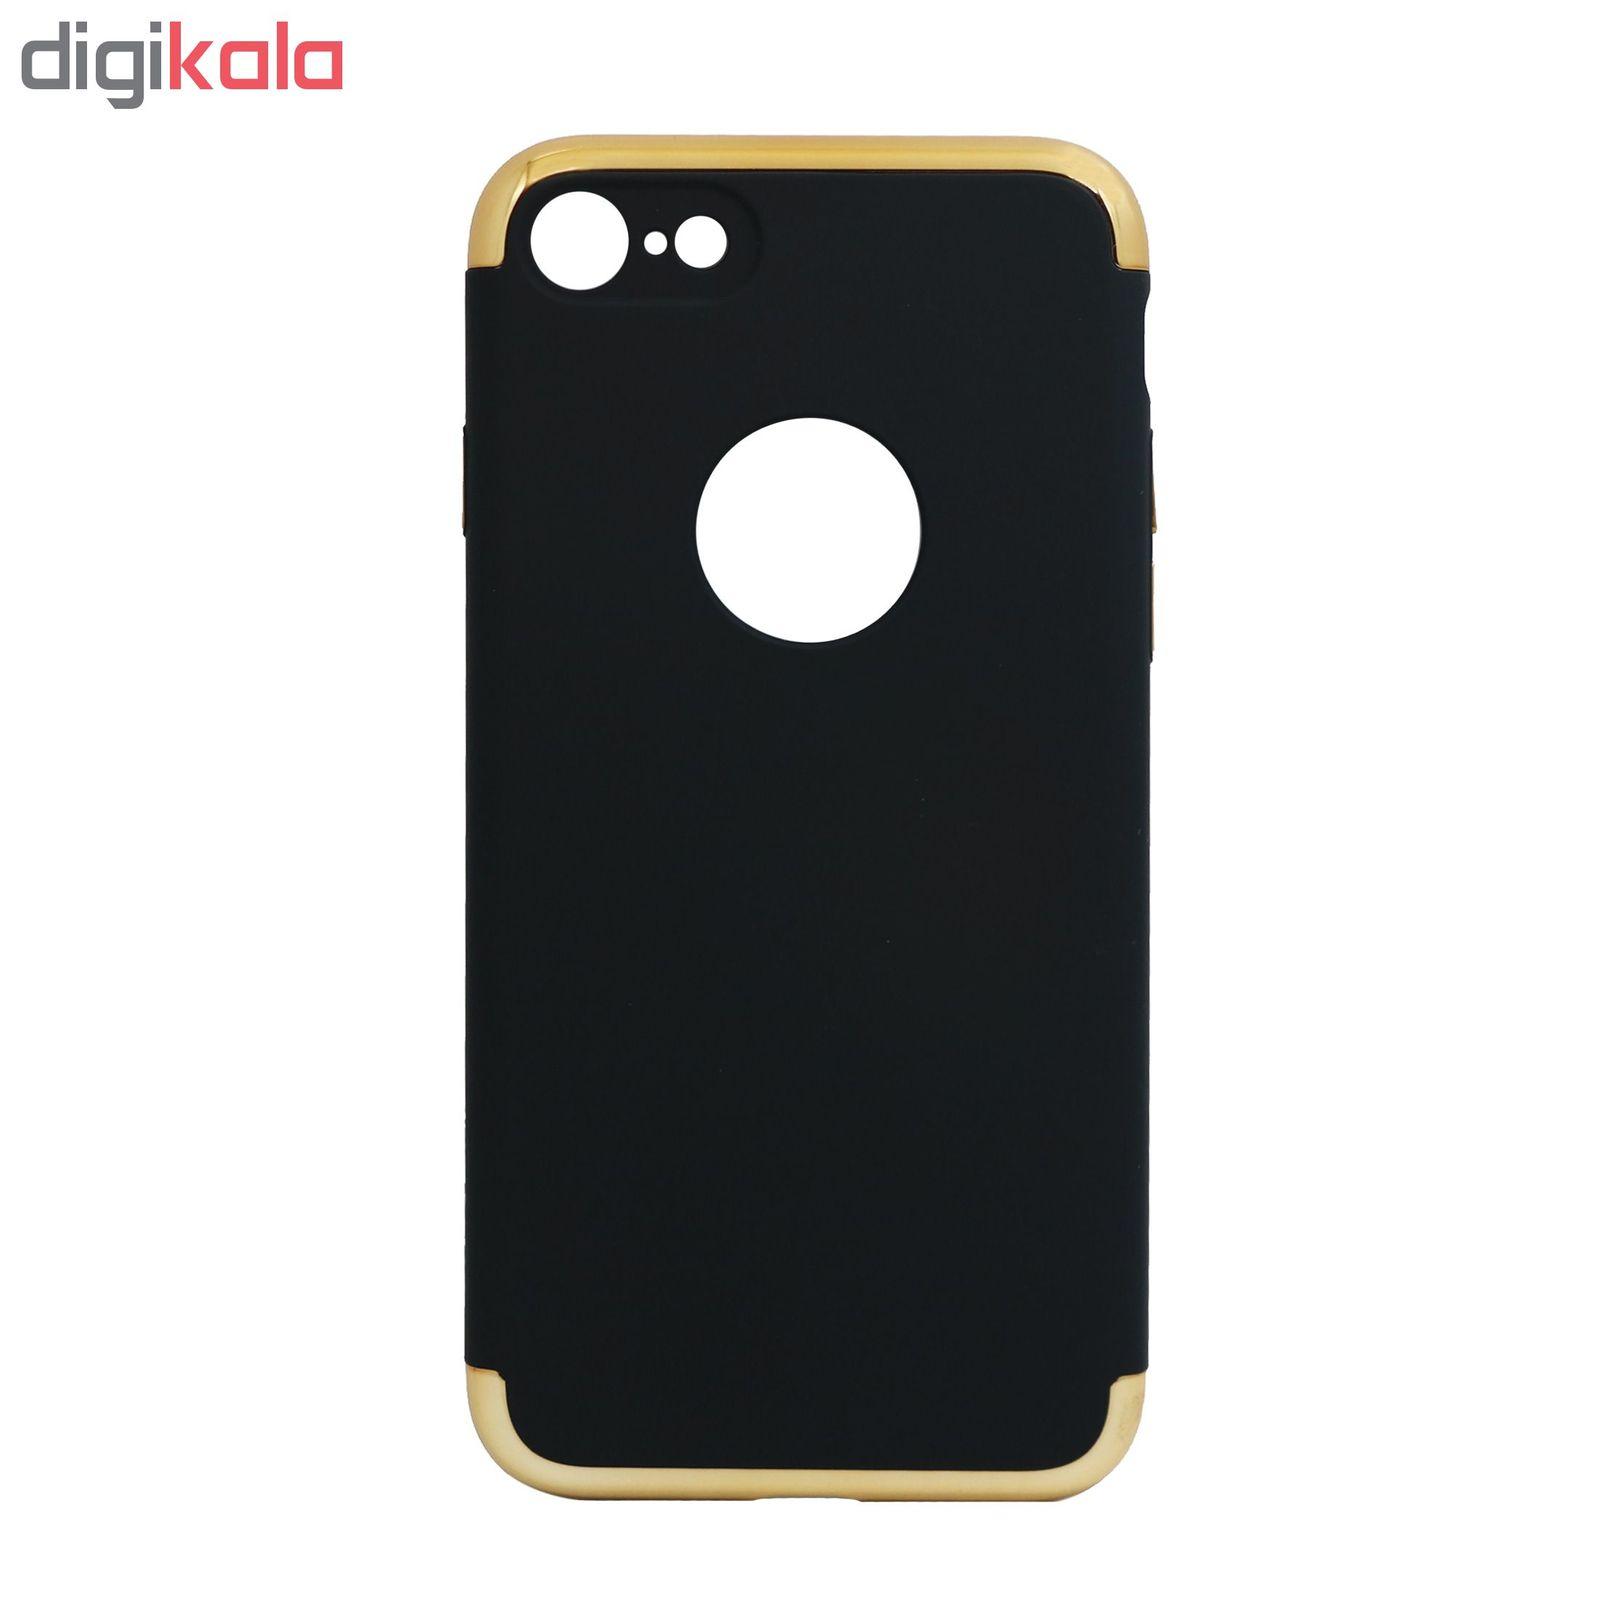 کاور جوی روم مدل LS-001 مناسب برای گوشی موبایل اپل iphone 7